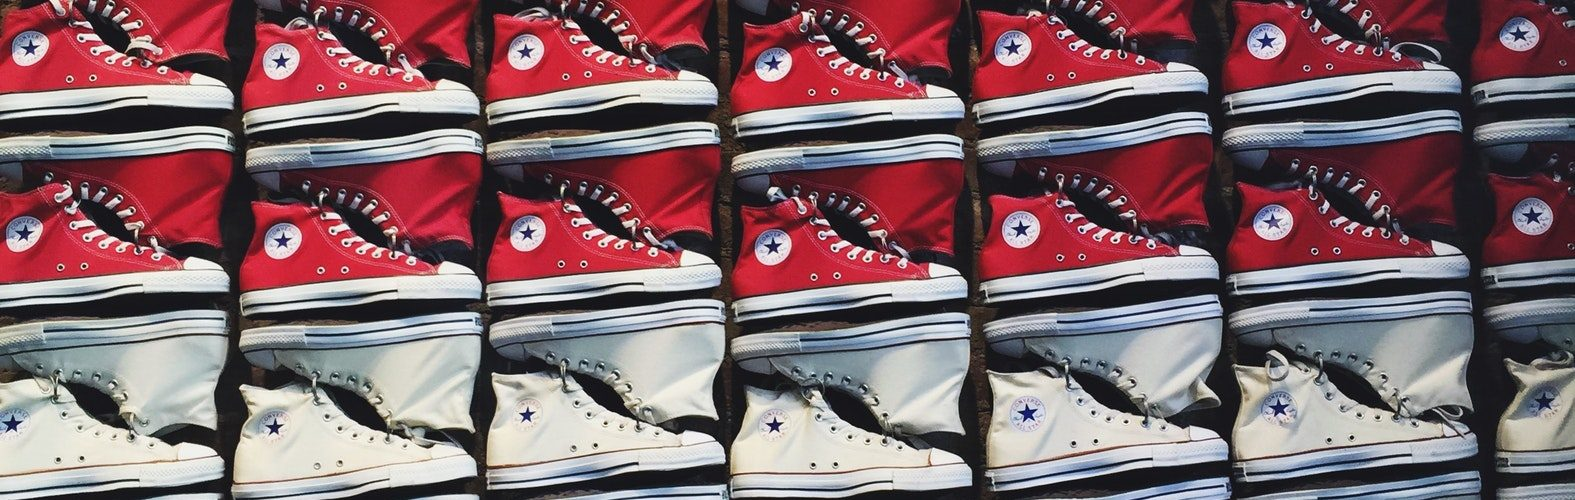 rode en witte schoenen